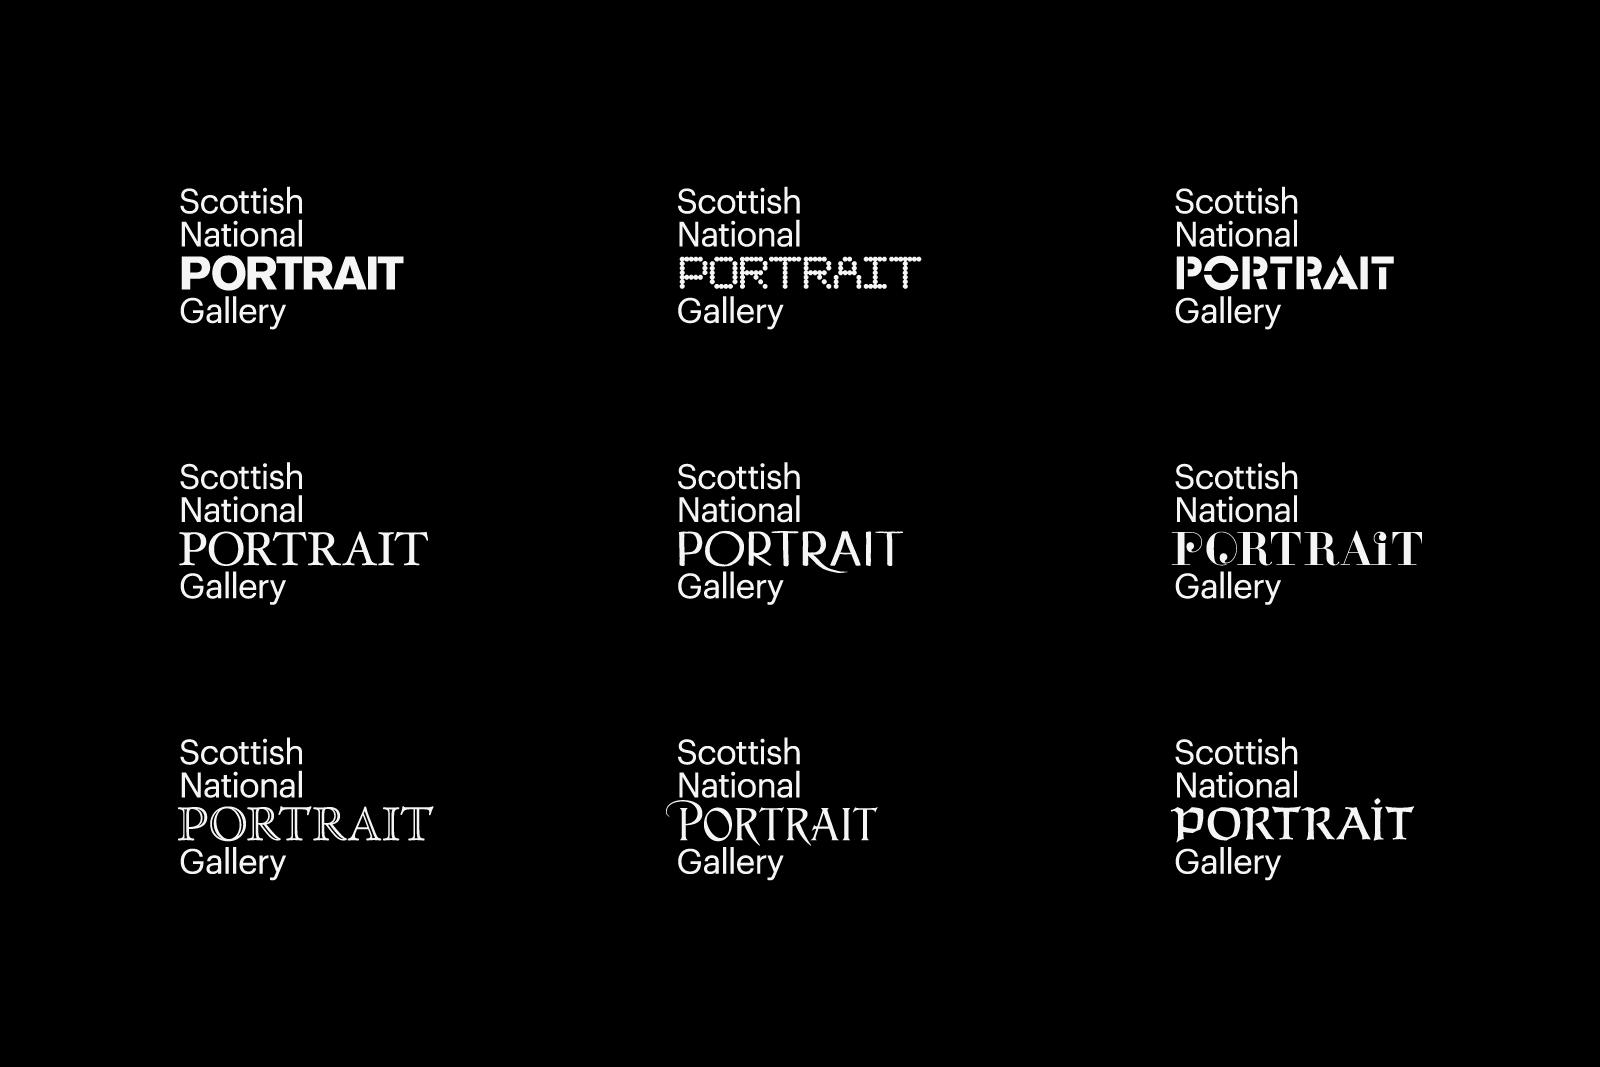 ostreet-portrait-gallery-23